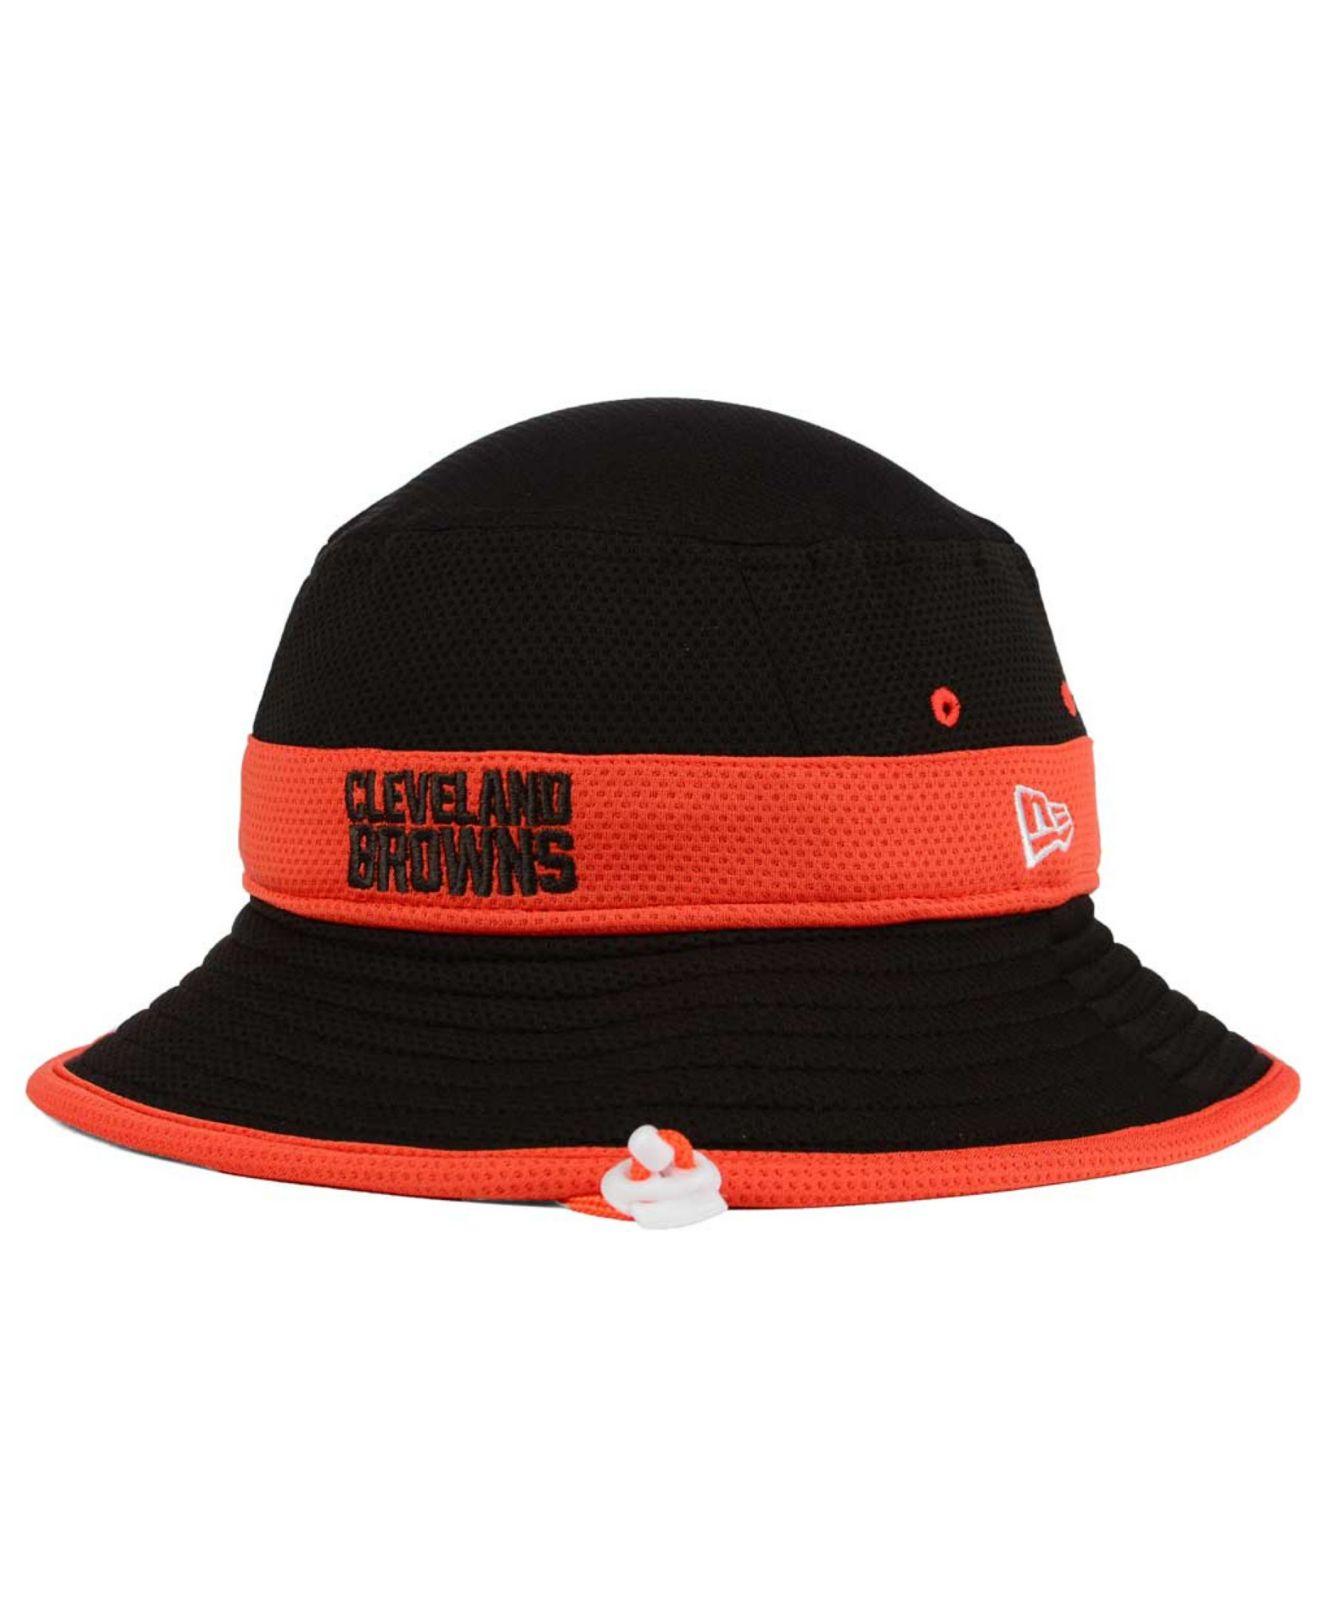 Lyst Ktz Cleveland Browns Training C Reverse Bucket Hat In. Men S New Era  Brown Cleveland Browns Fan ... 8068de8c2